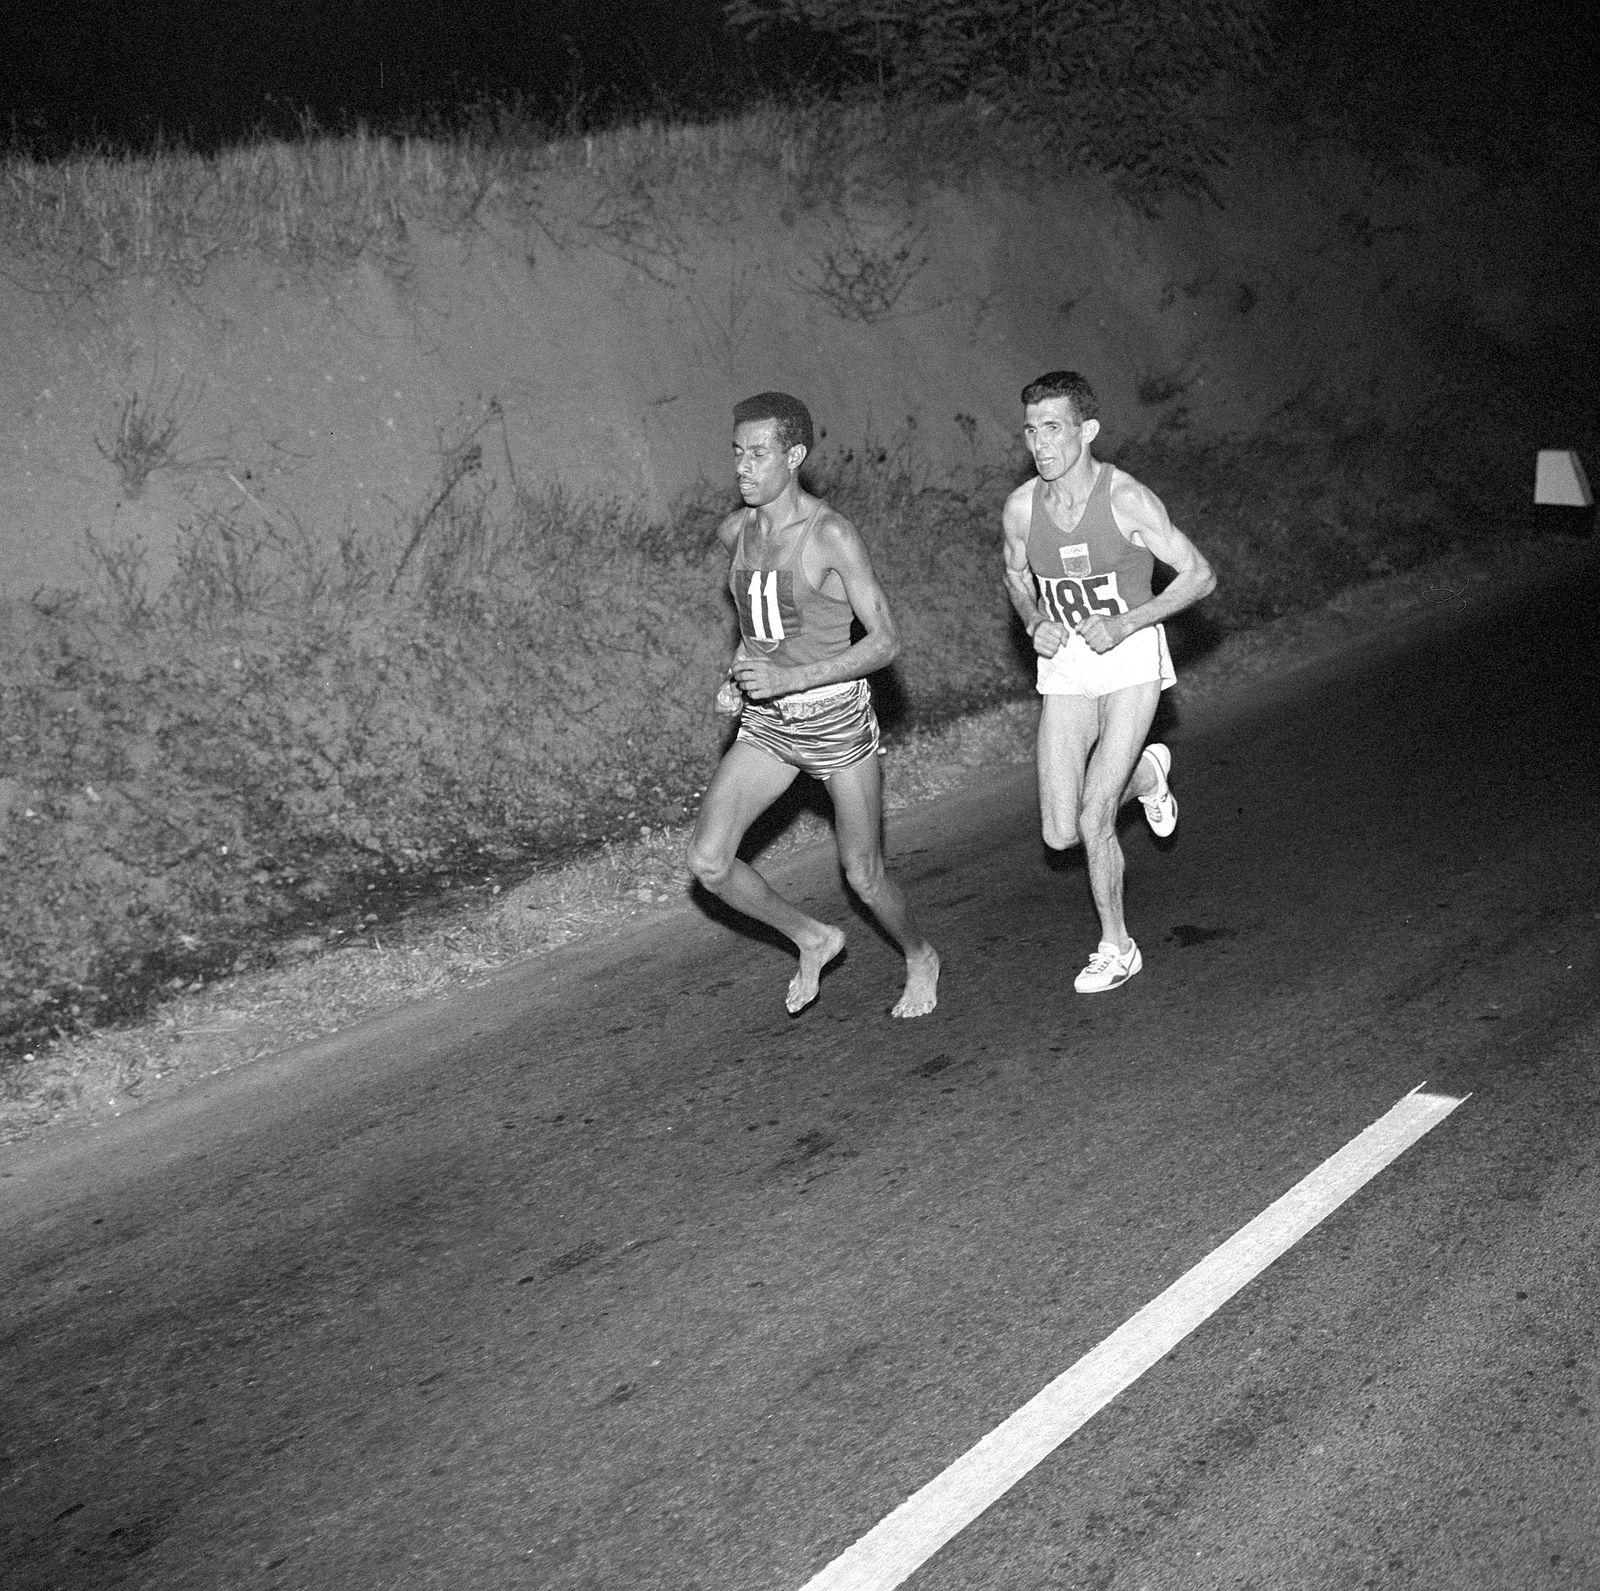 Rom 1960: Marathon; Abebe Bikila f¸hrt vor Rhadi